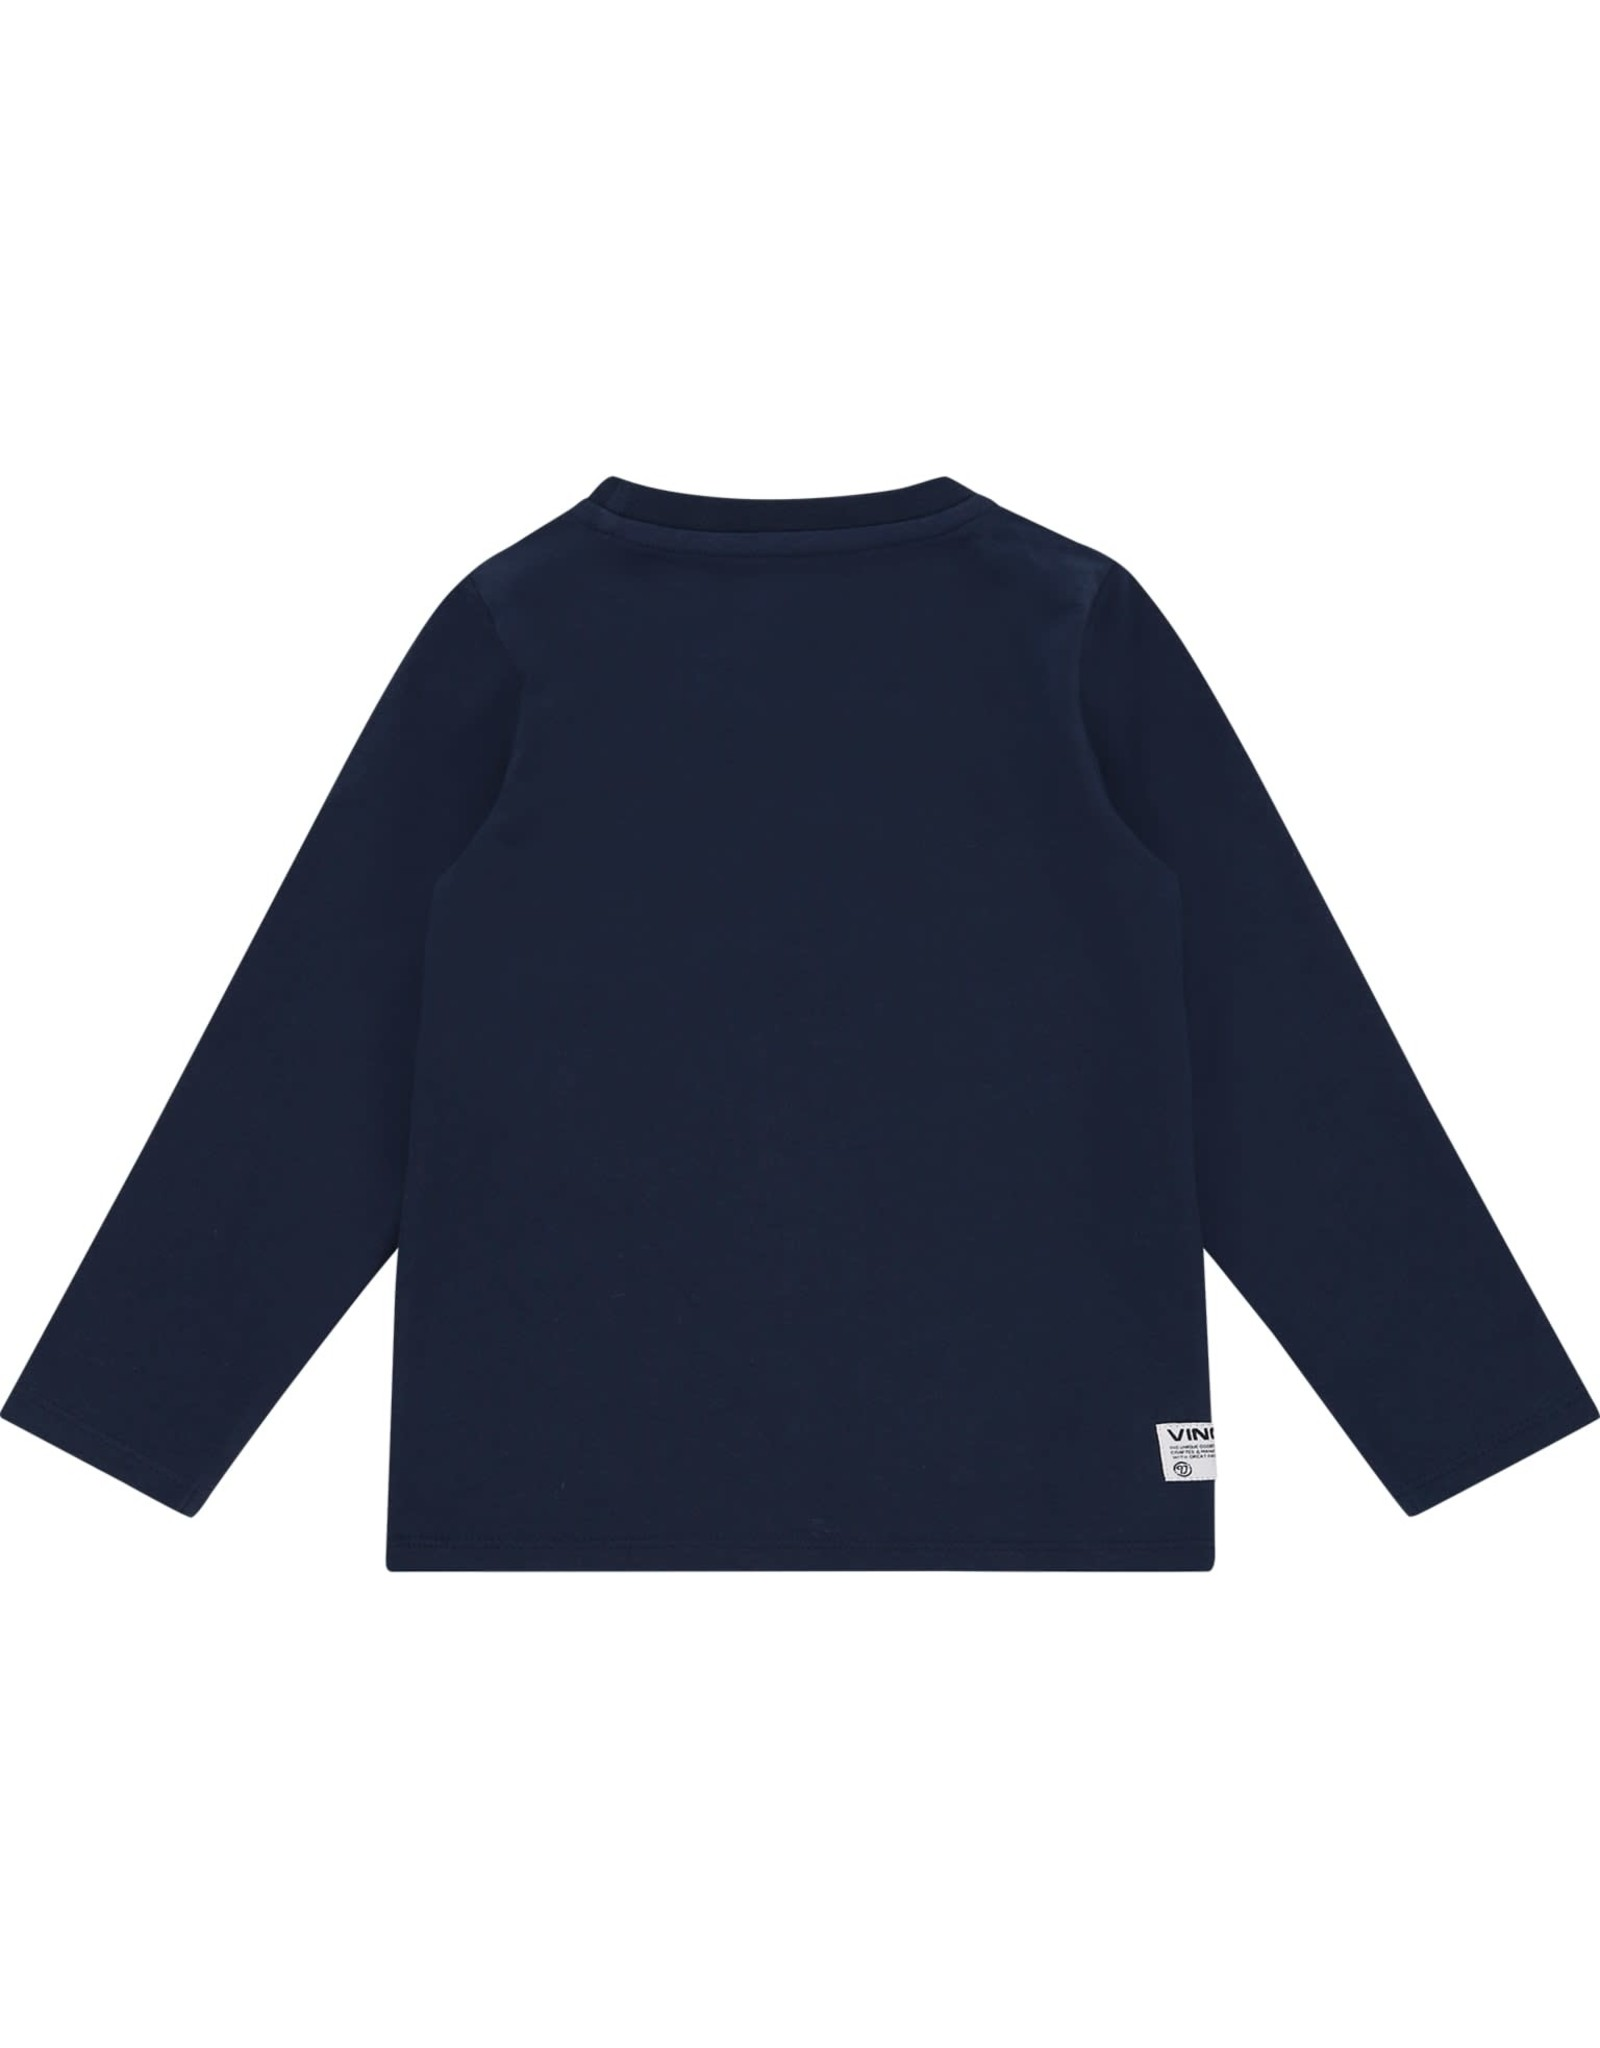 Vingino Vingino jongens shirt Jadey Mini Dark Blue